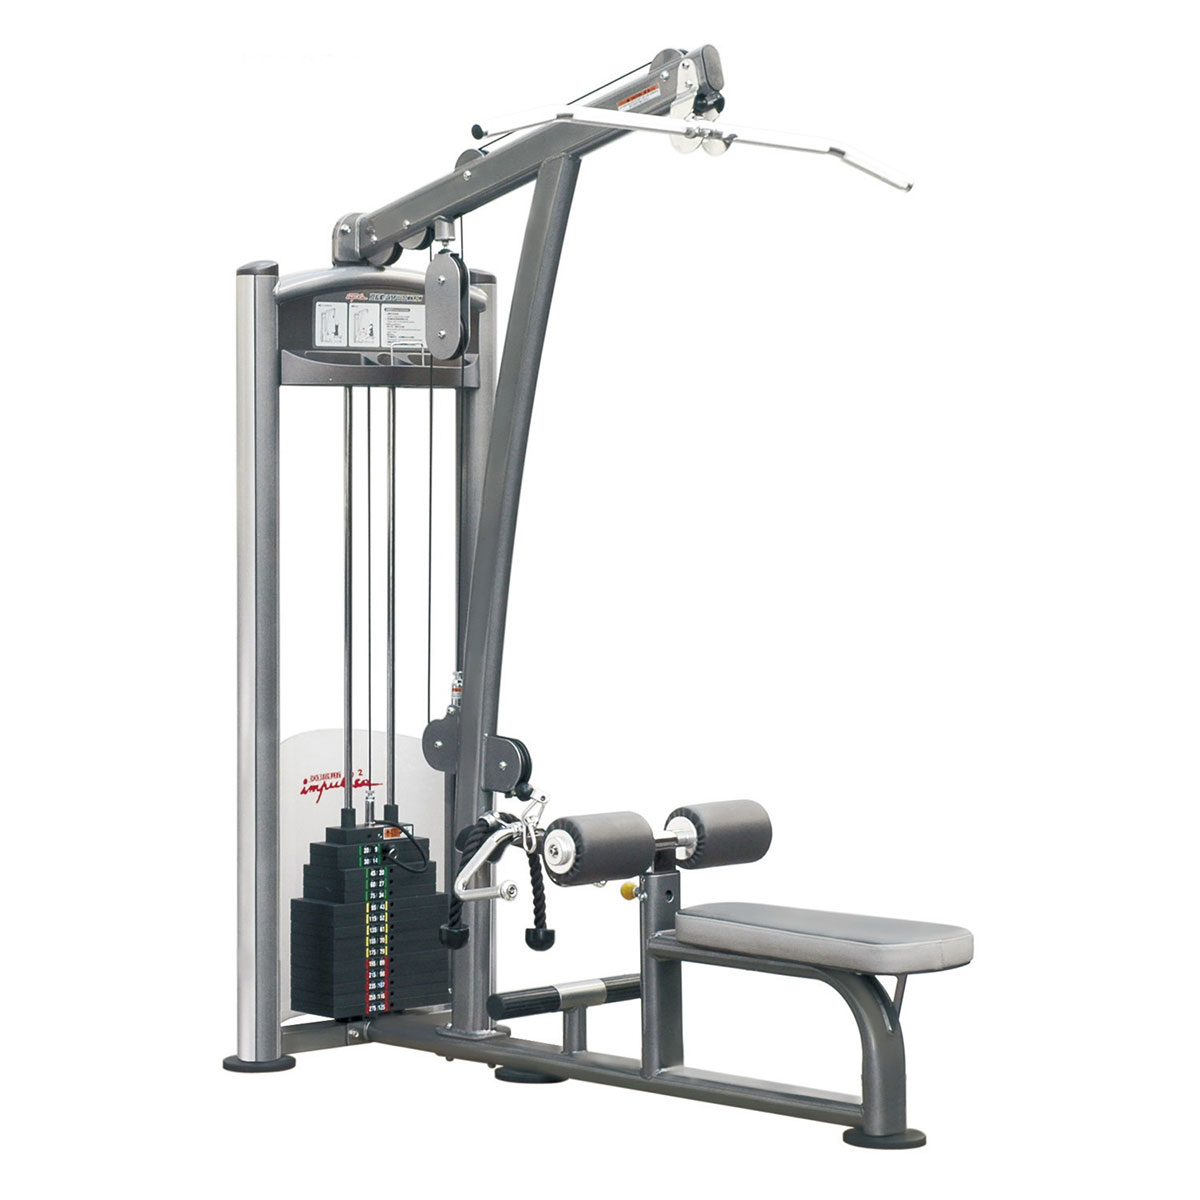 Lat Pulldown / Low Row - 200 lbs